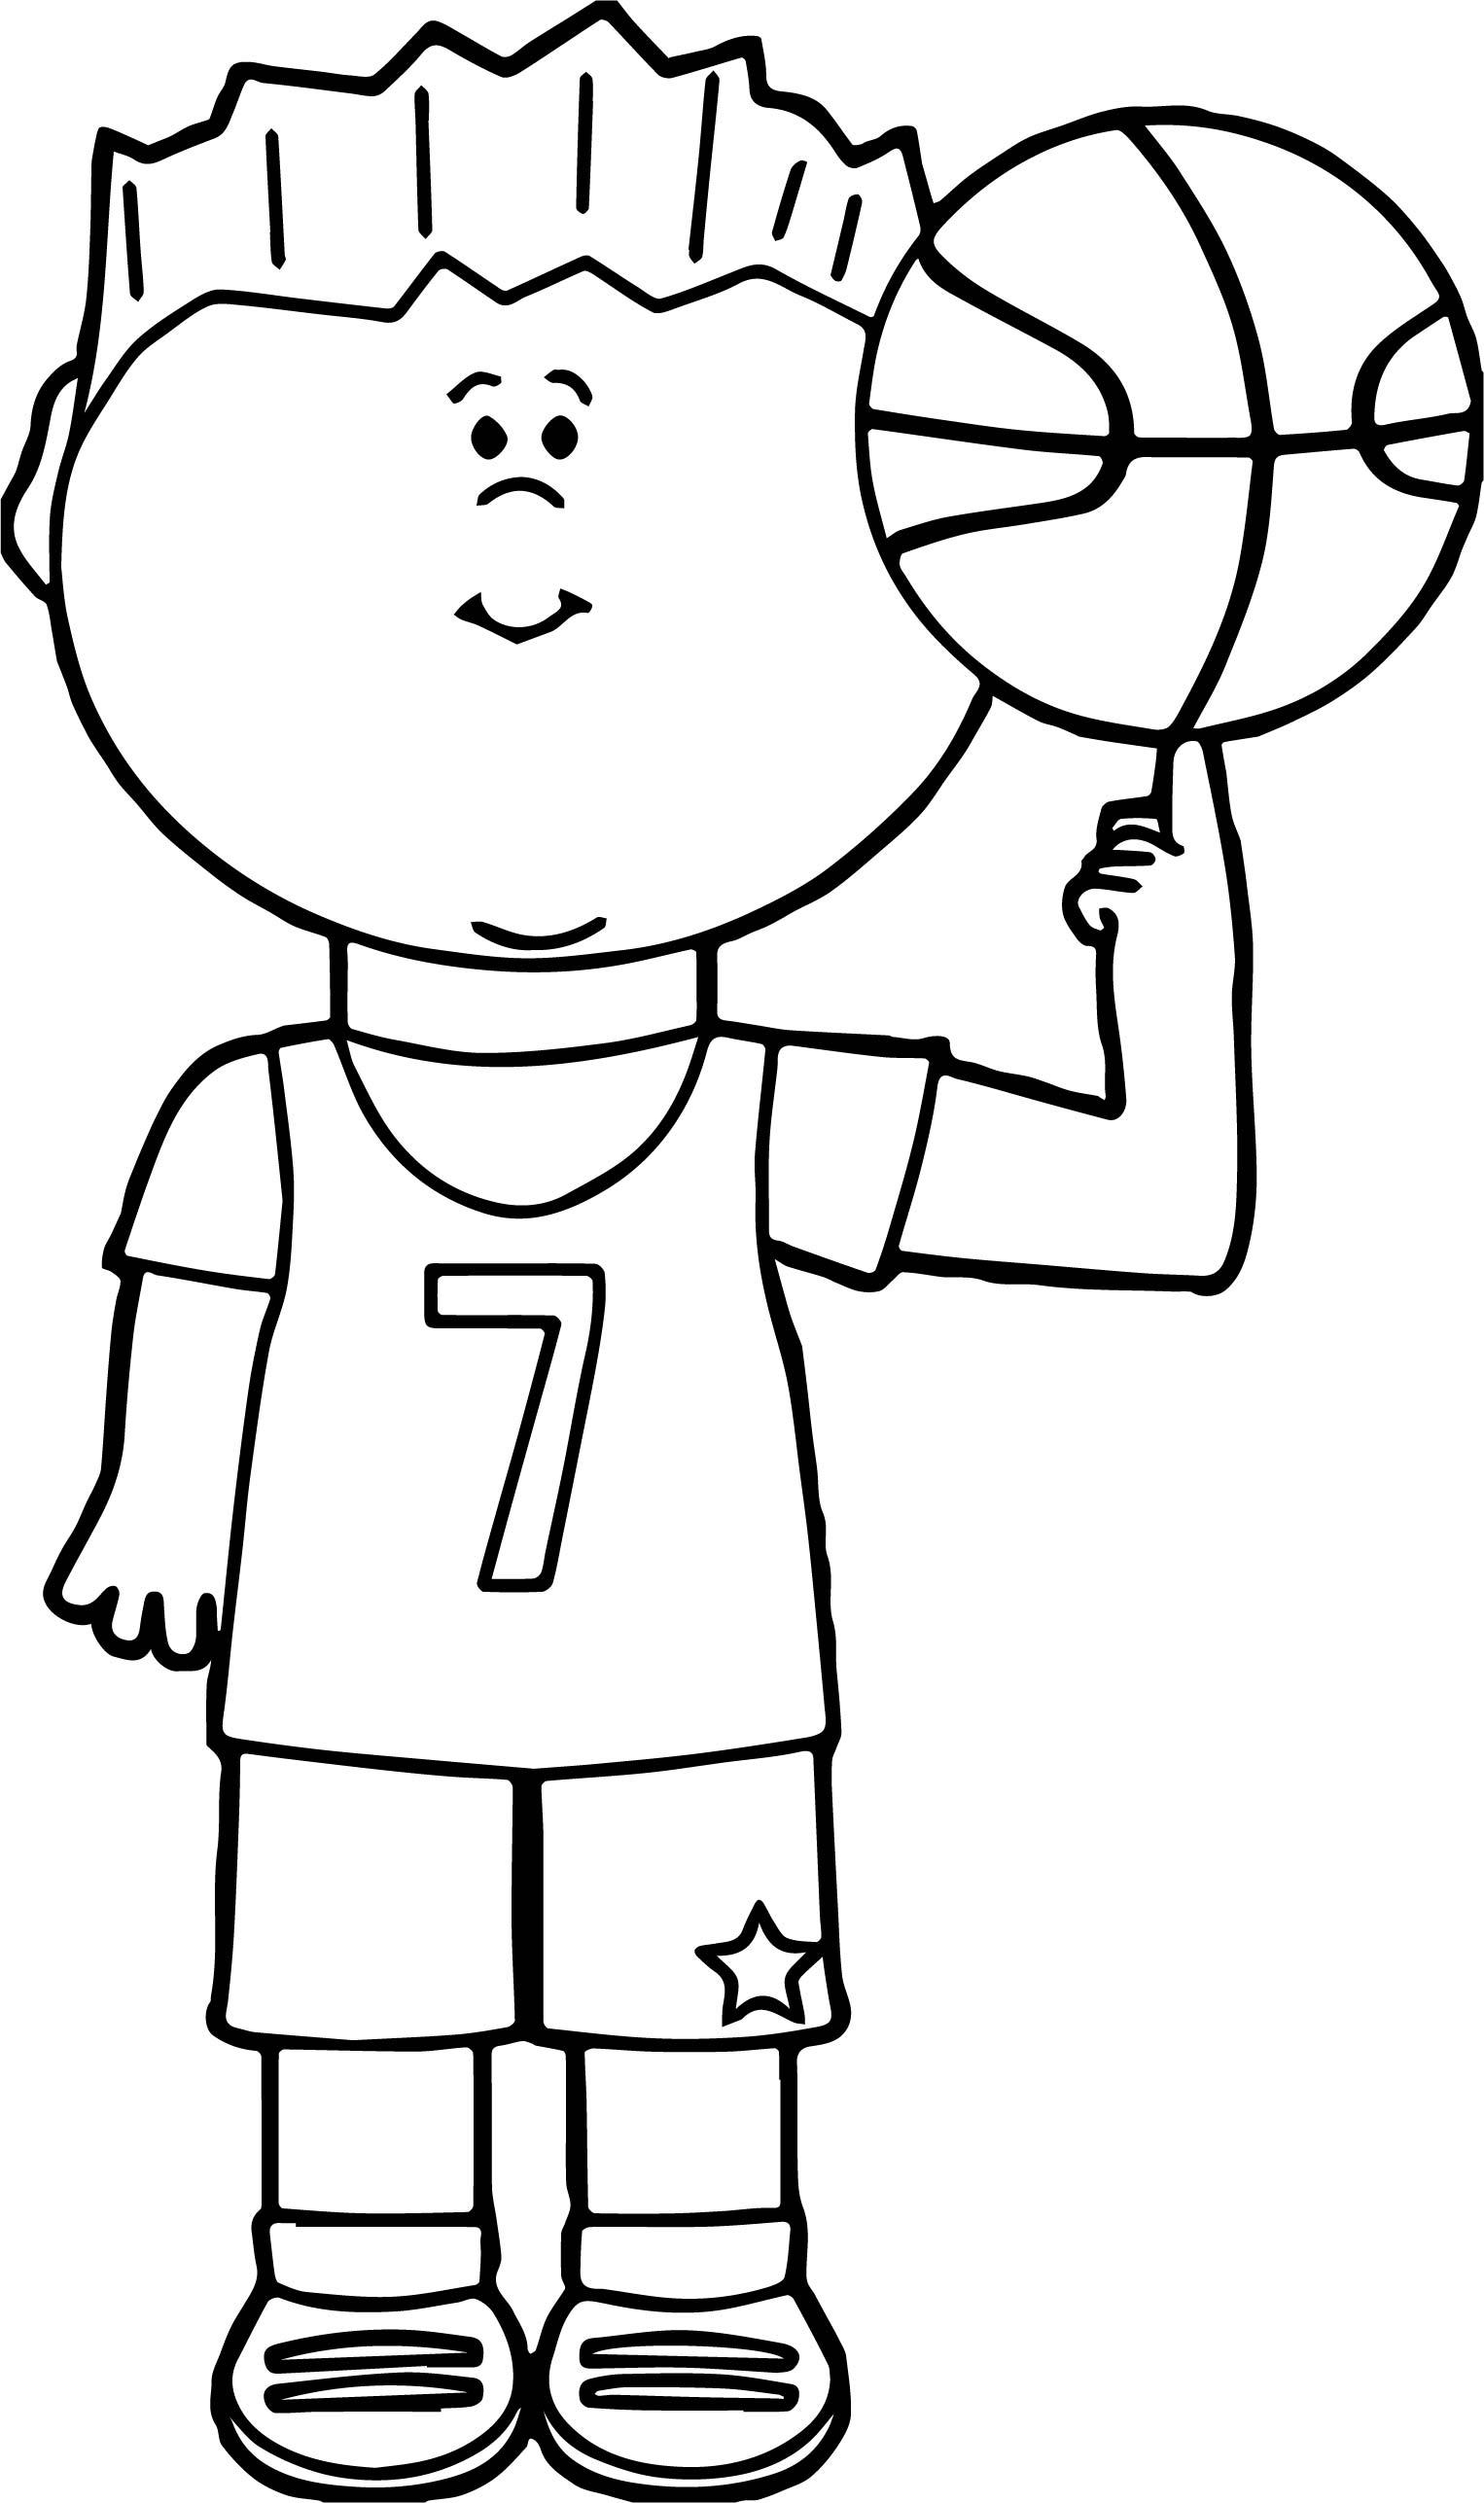 Child Player Balancing Basketball On Finger Playing